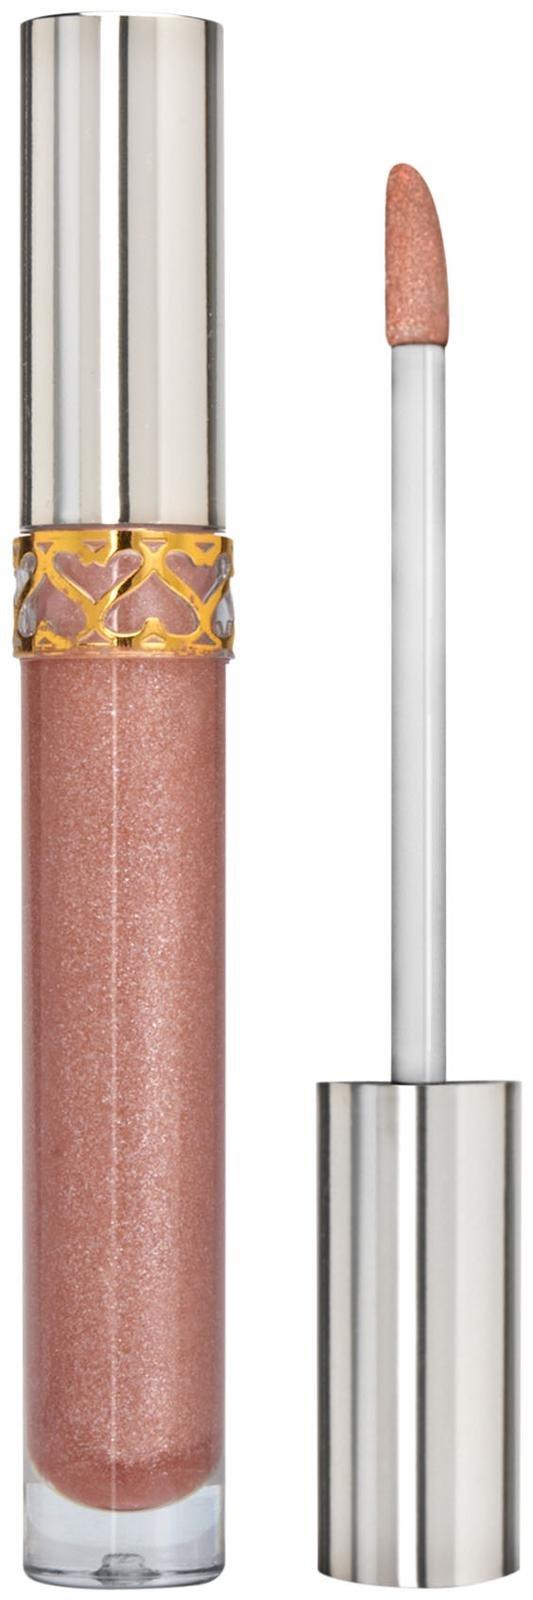 Stila Magnificent Metals Lip Gloss in Rose Quartz